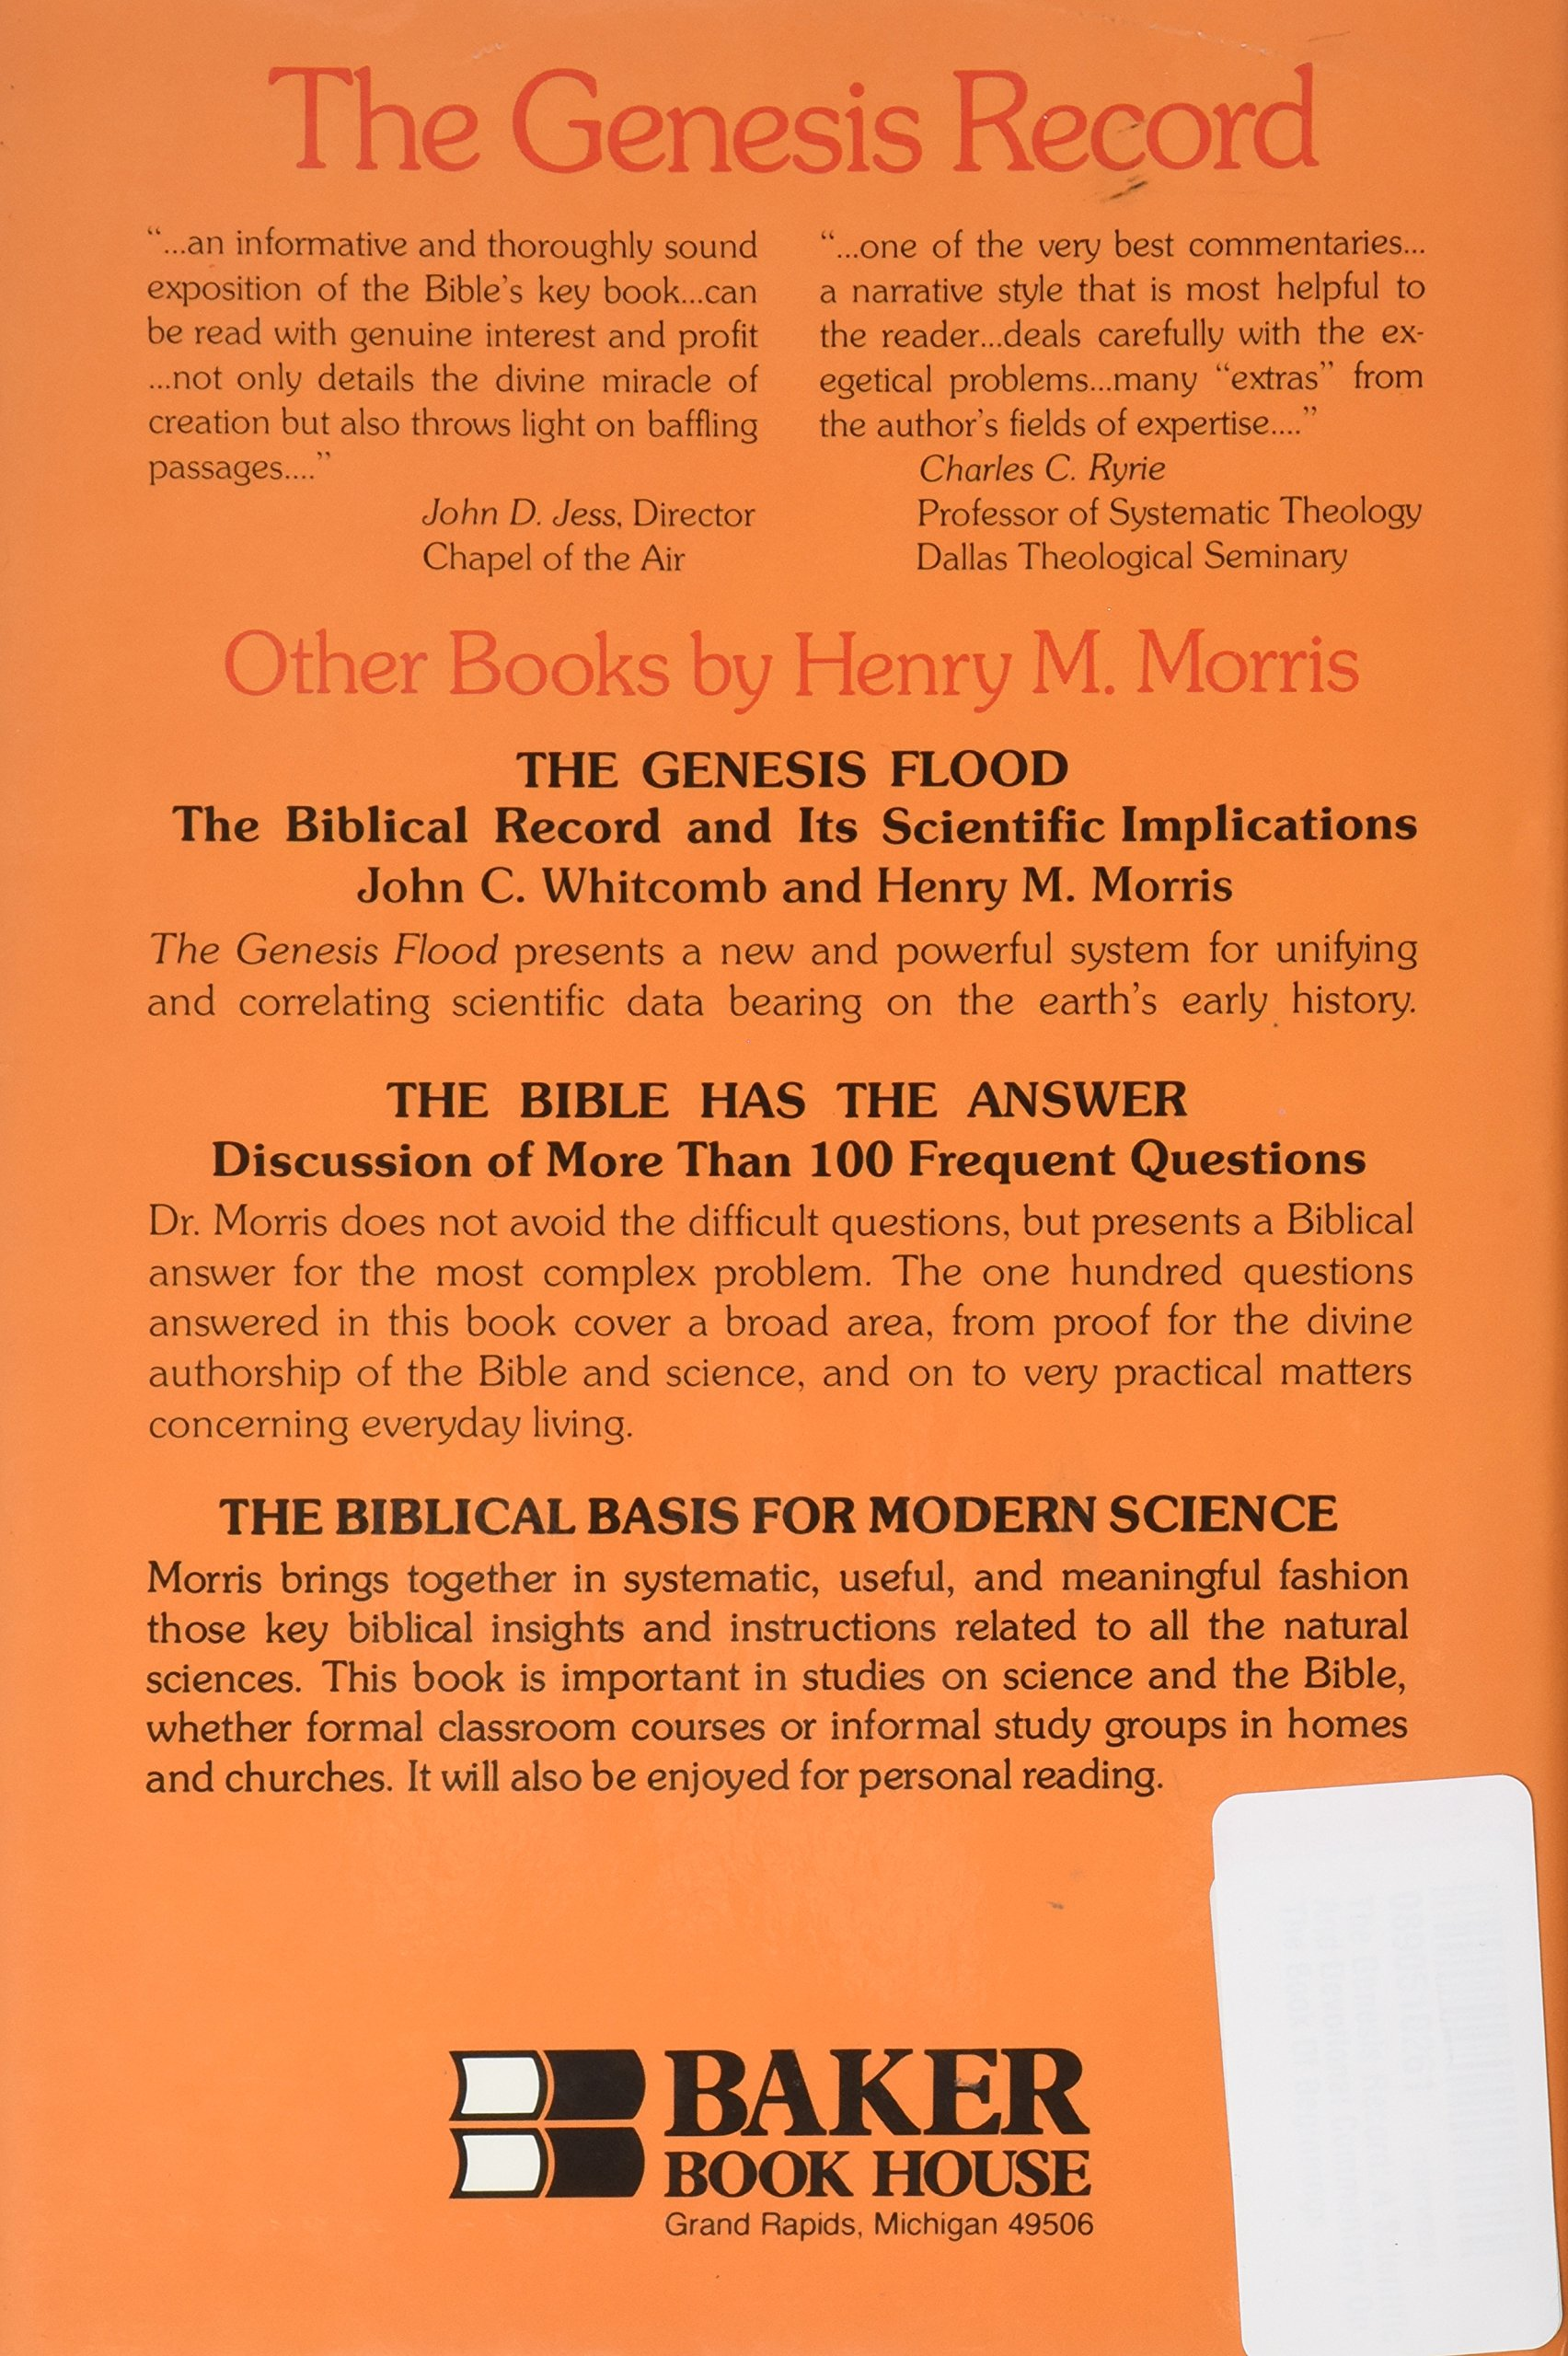 THE GENESIS RECORD HENRY MORRIS PDF